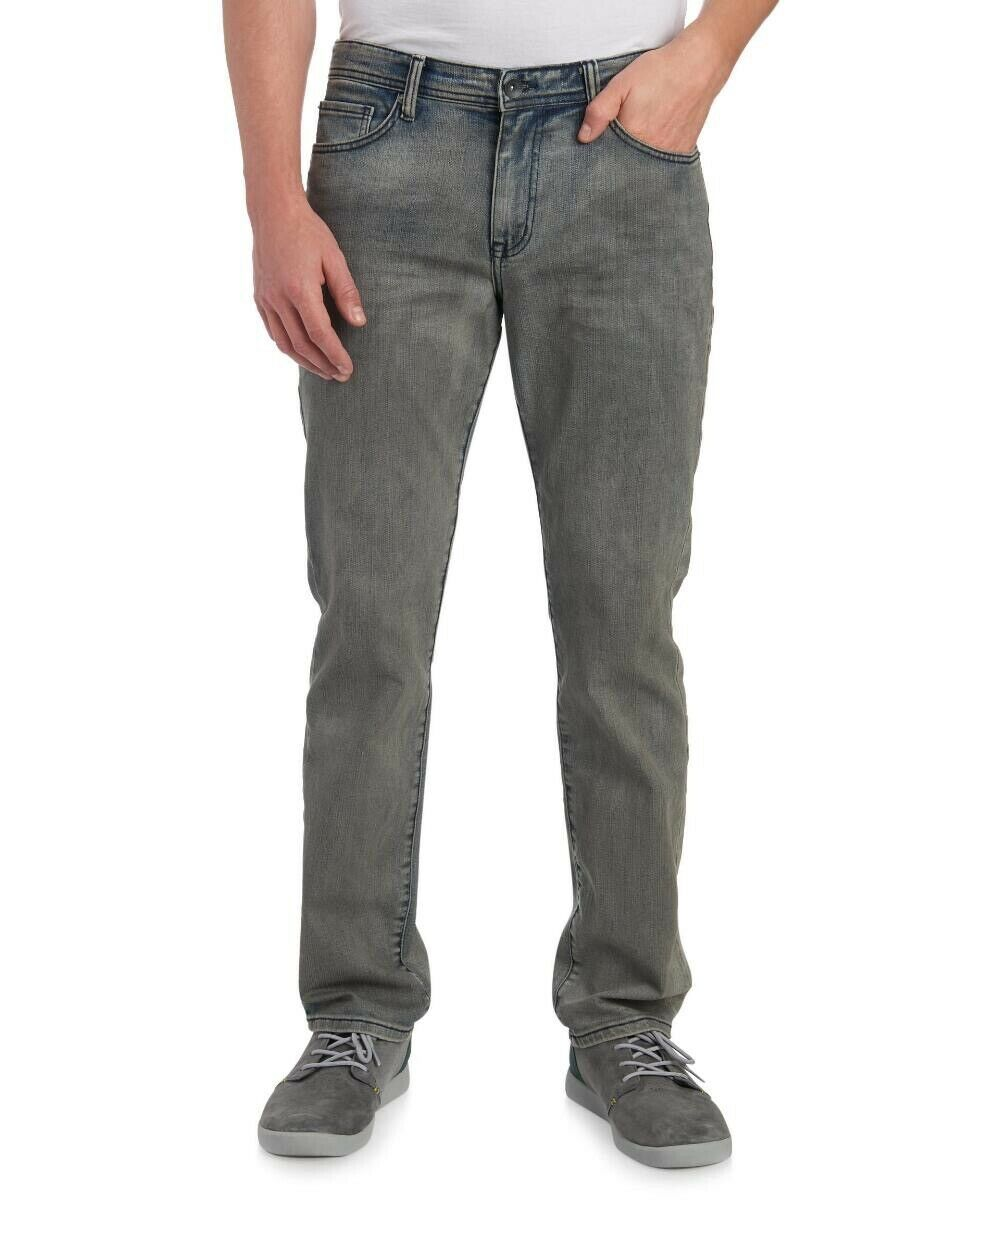 William Rast Mens Smoke Bleach Slim Straight bluee Jeans NWT  Size 36 x 32